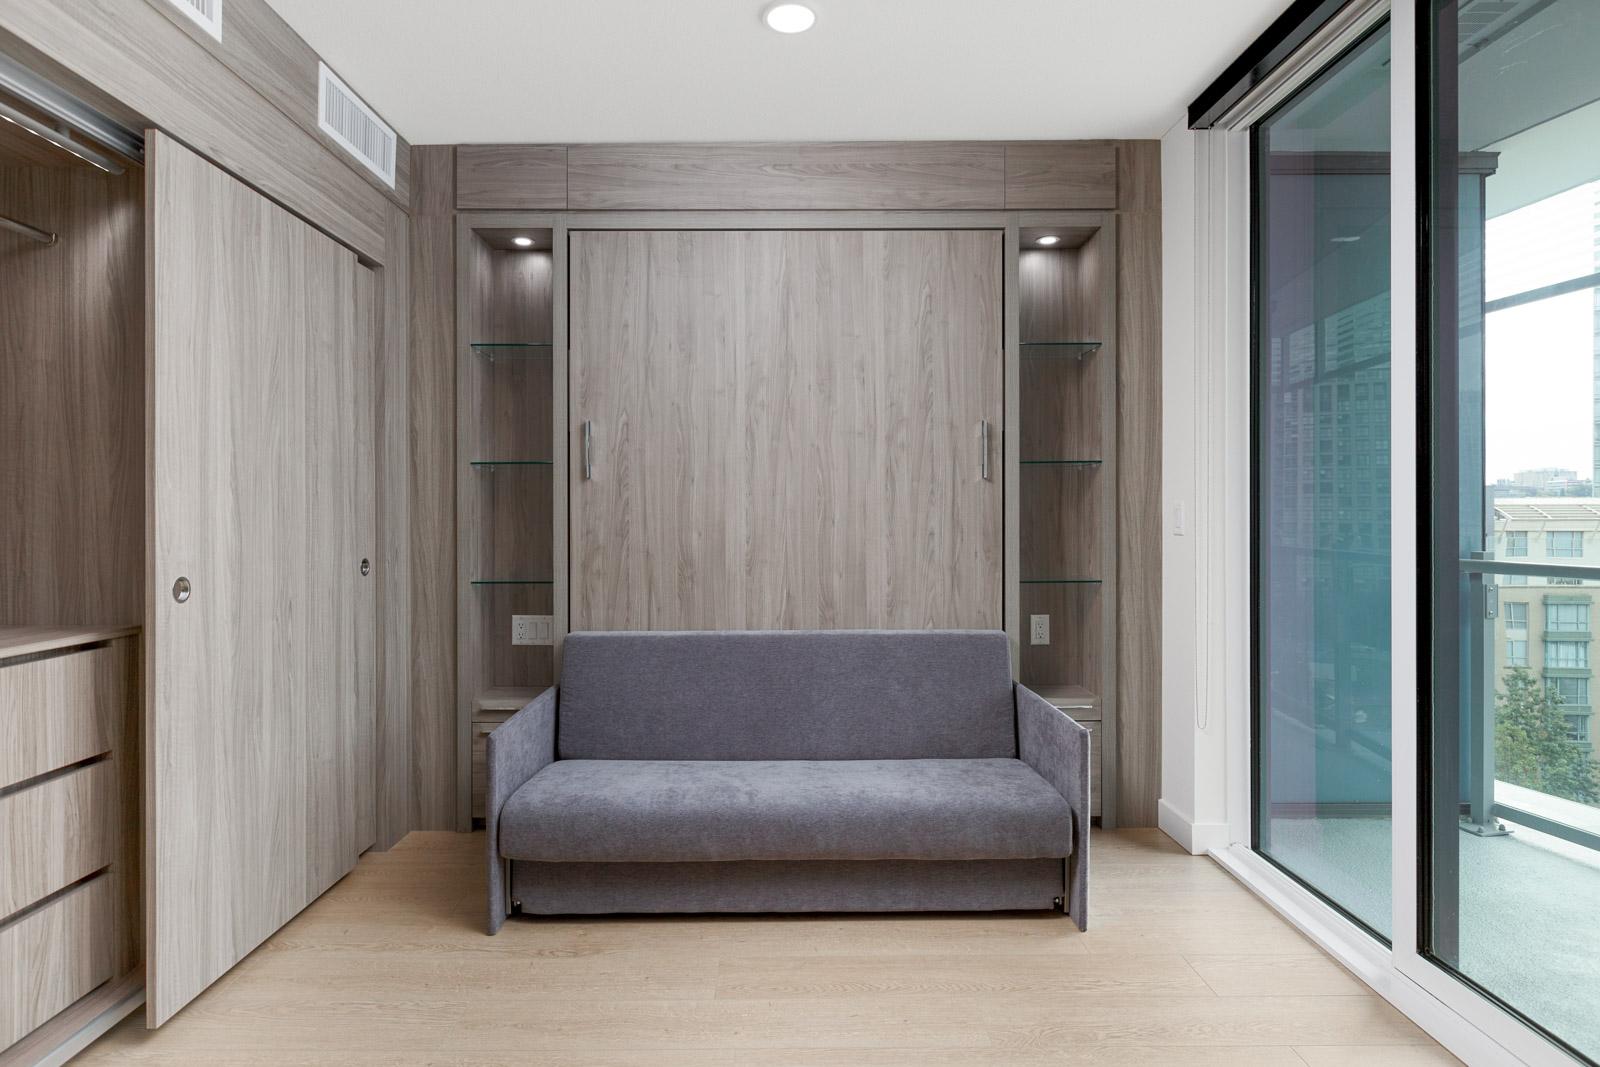 murphy bed sofa in bedroom of arc rental condo with dark wood wall